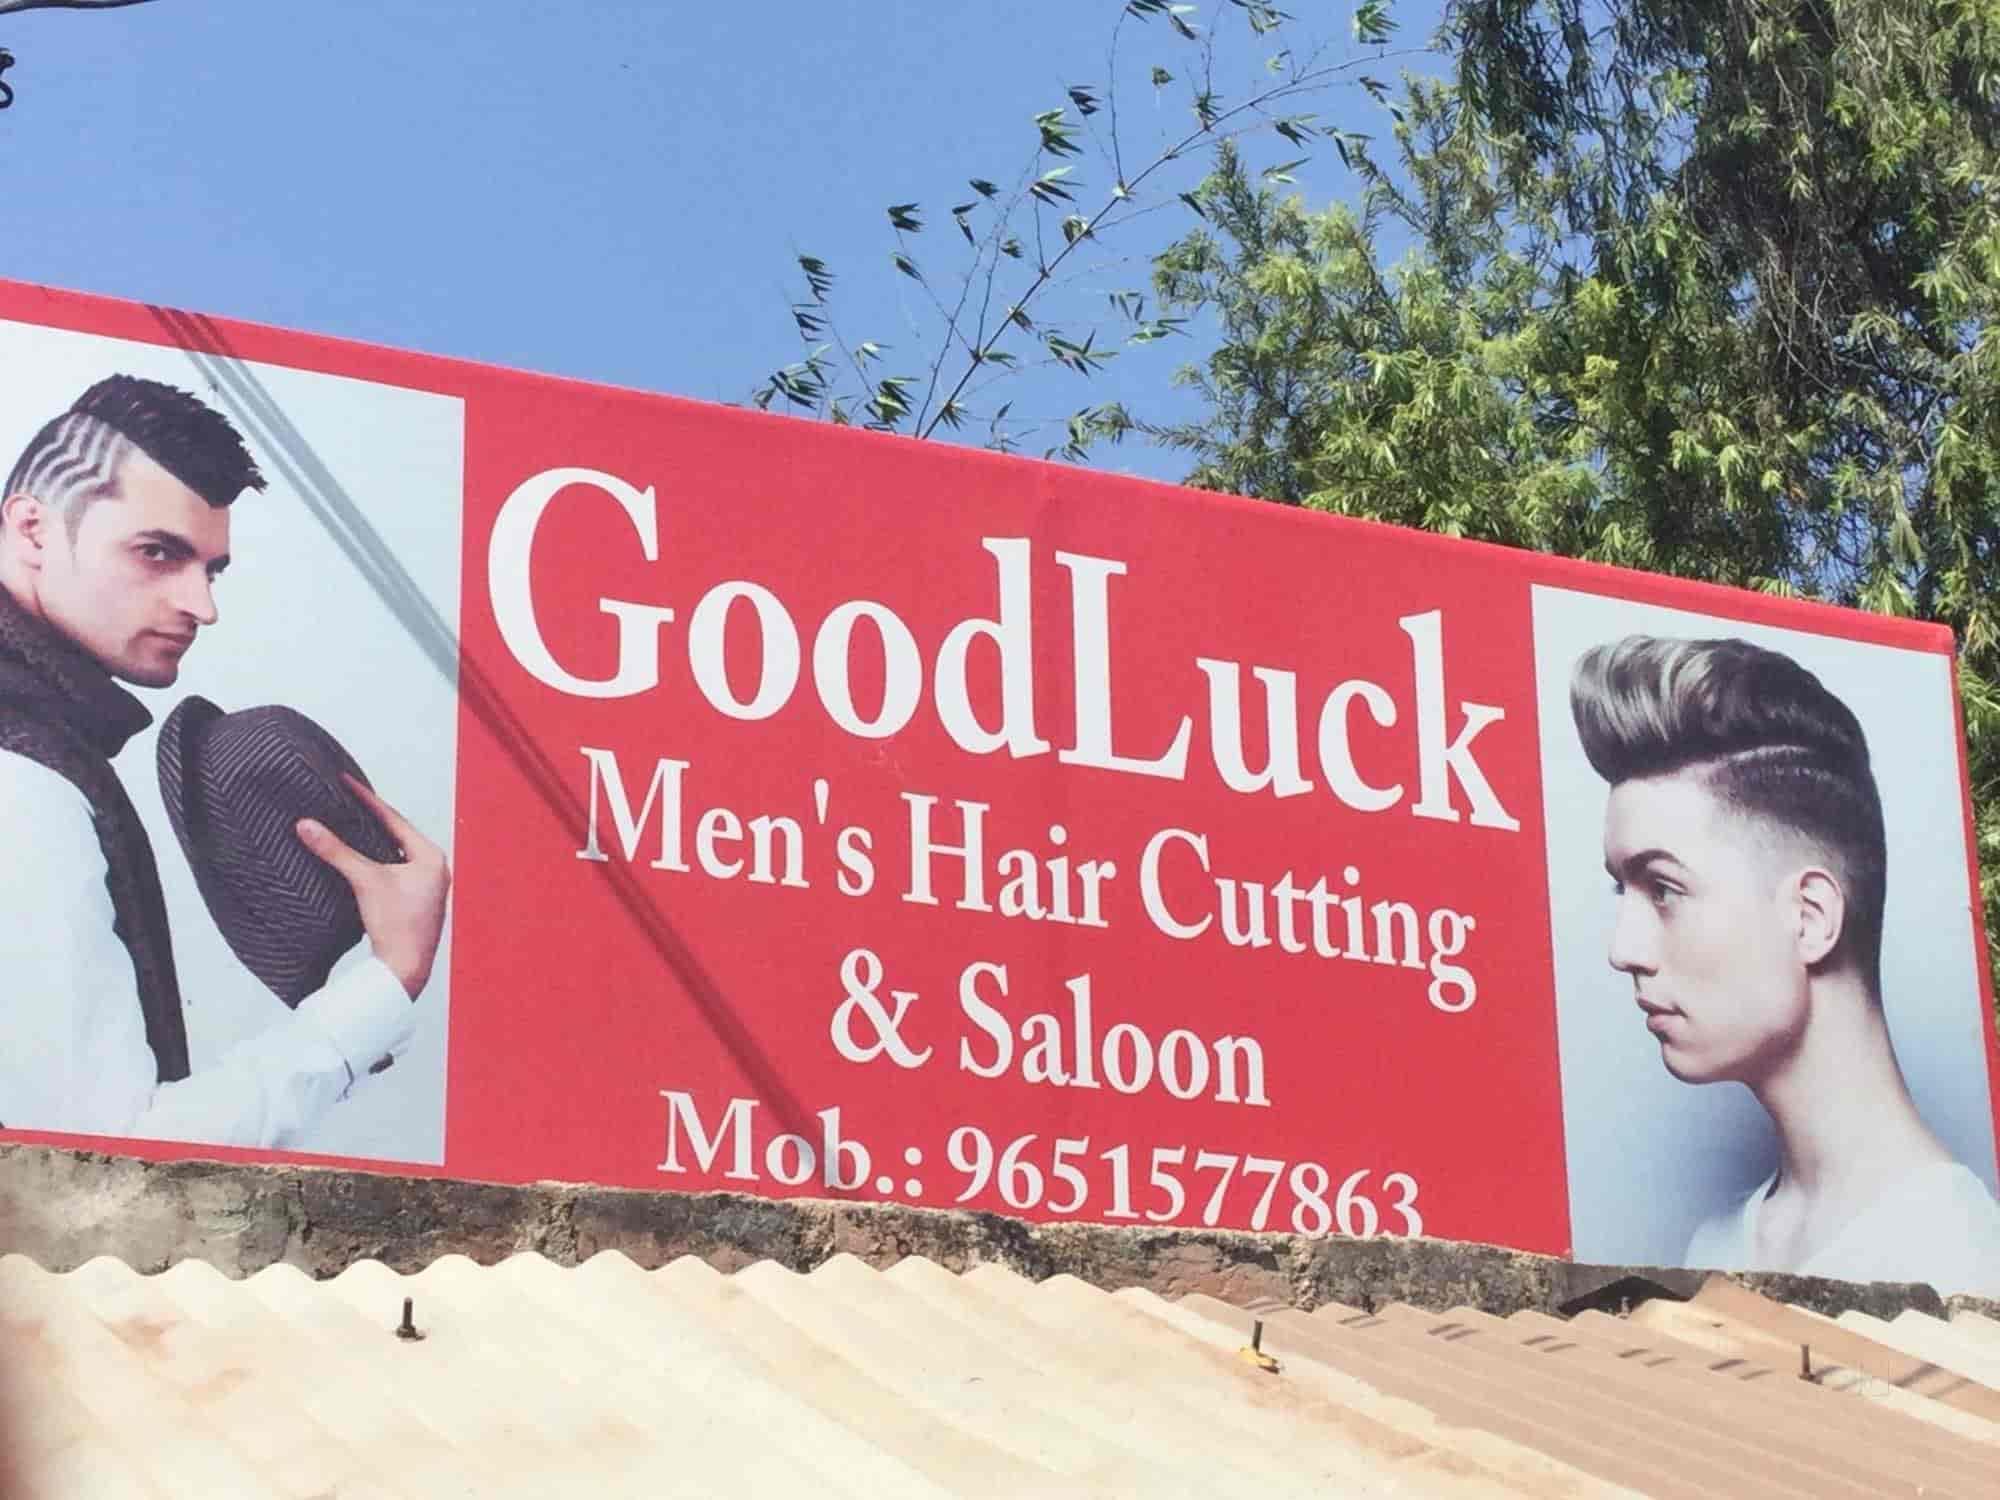 Goodluck Hair Cutting Aliganj Salons In Lucknow Justdial